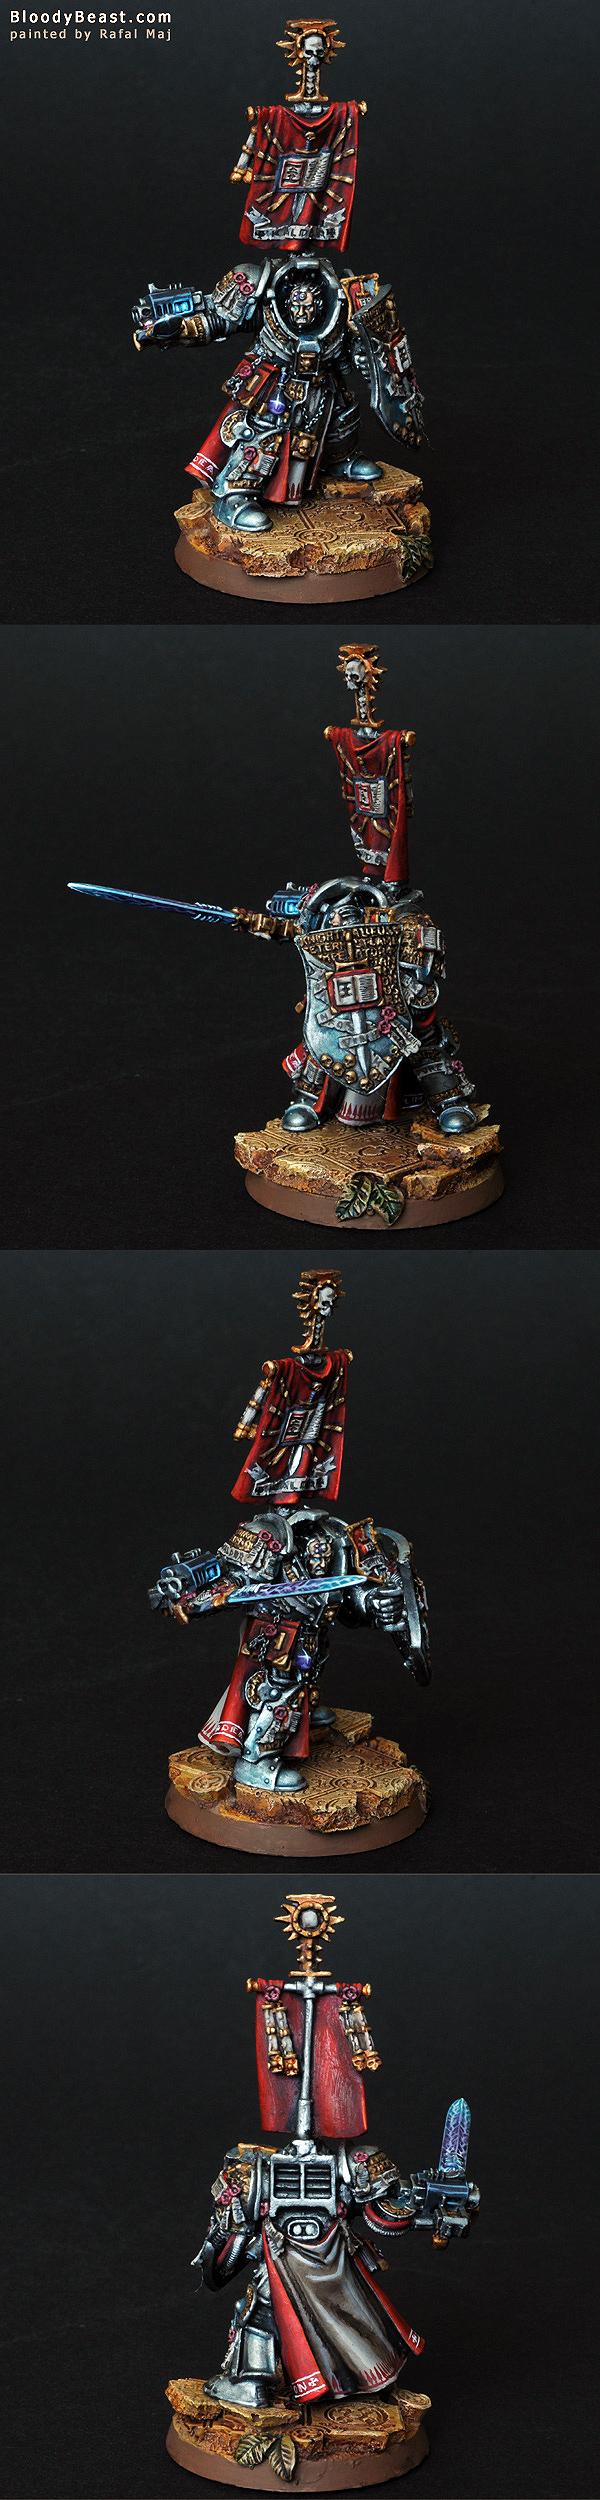 Lord Kaldor Draigo the Supreme Grand Master of the Grey Knights painted by Rafal Maj (BloodyBeast.com)